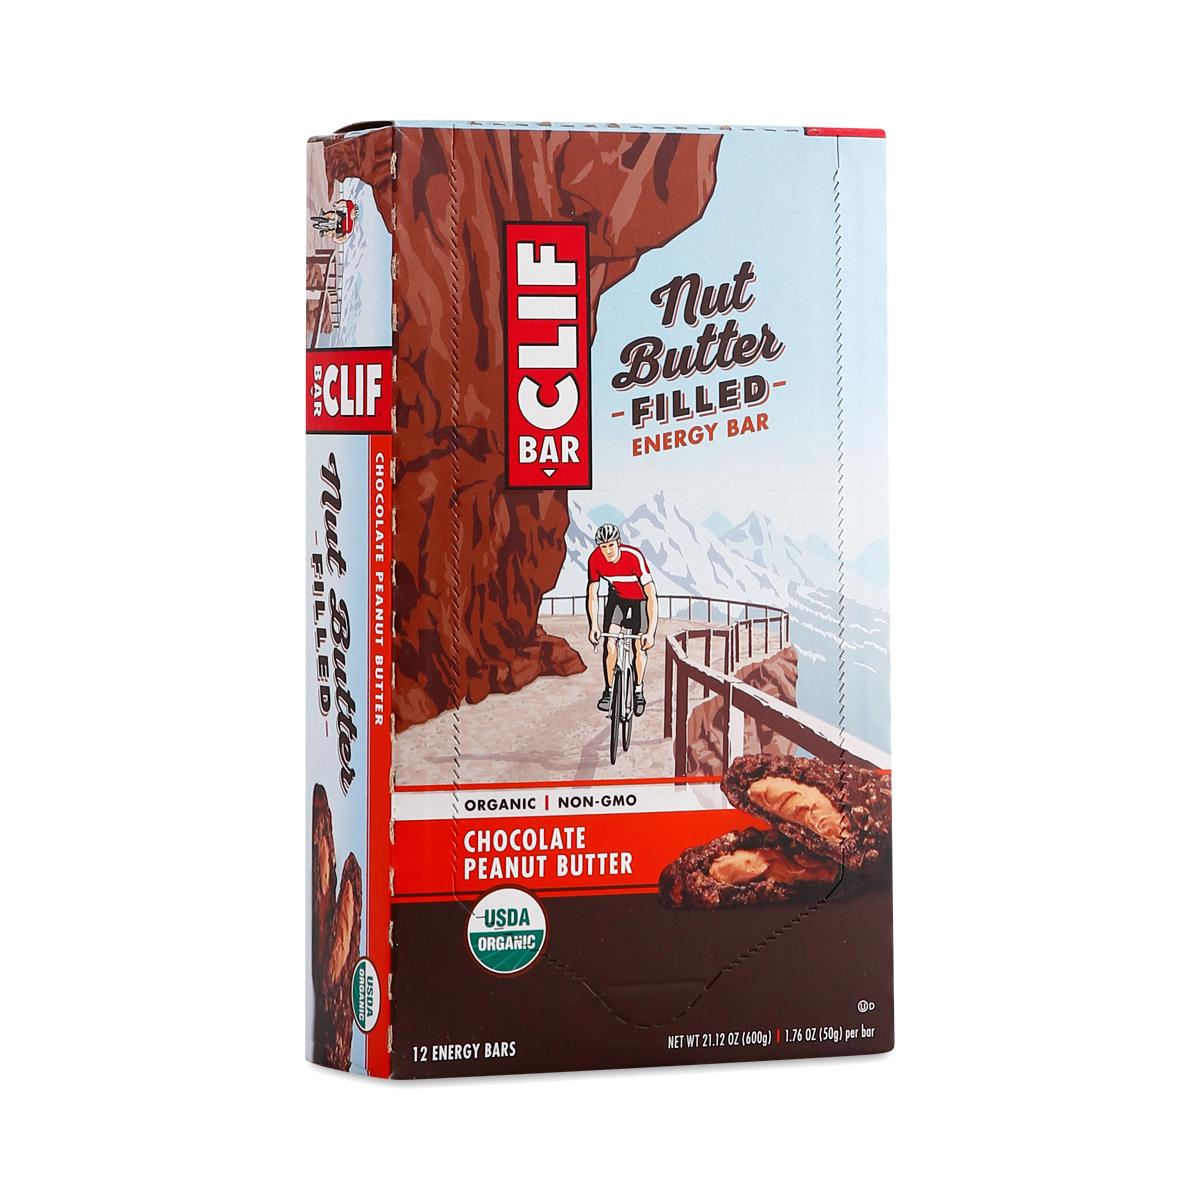 Clif Bar Nut Butter Filled Chocolate Peanut Butter Bars twelve 1.76 oz bars